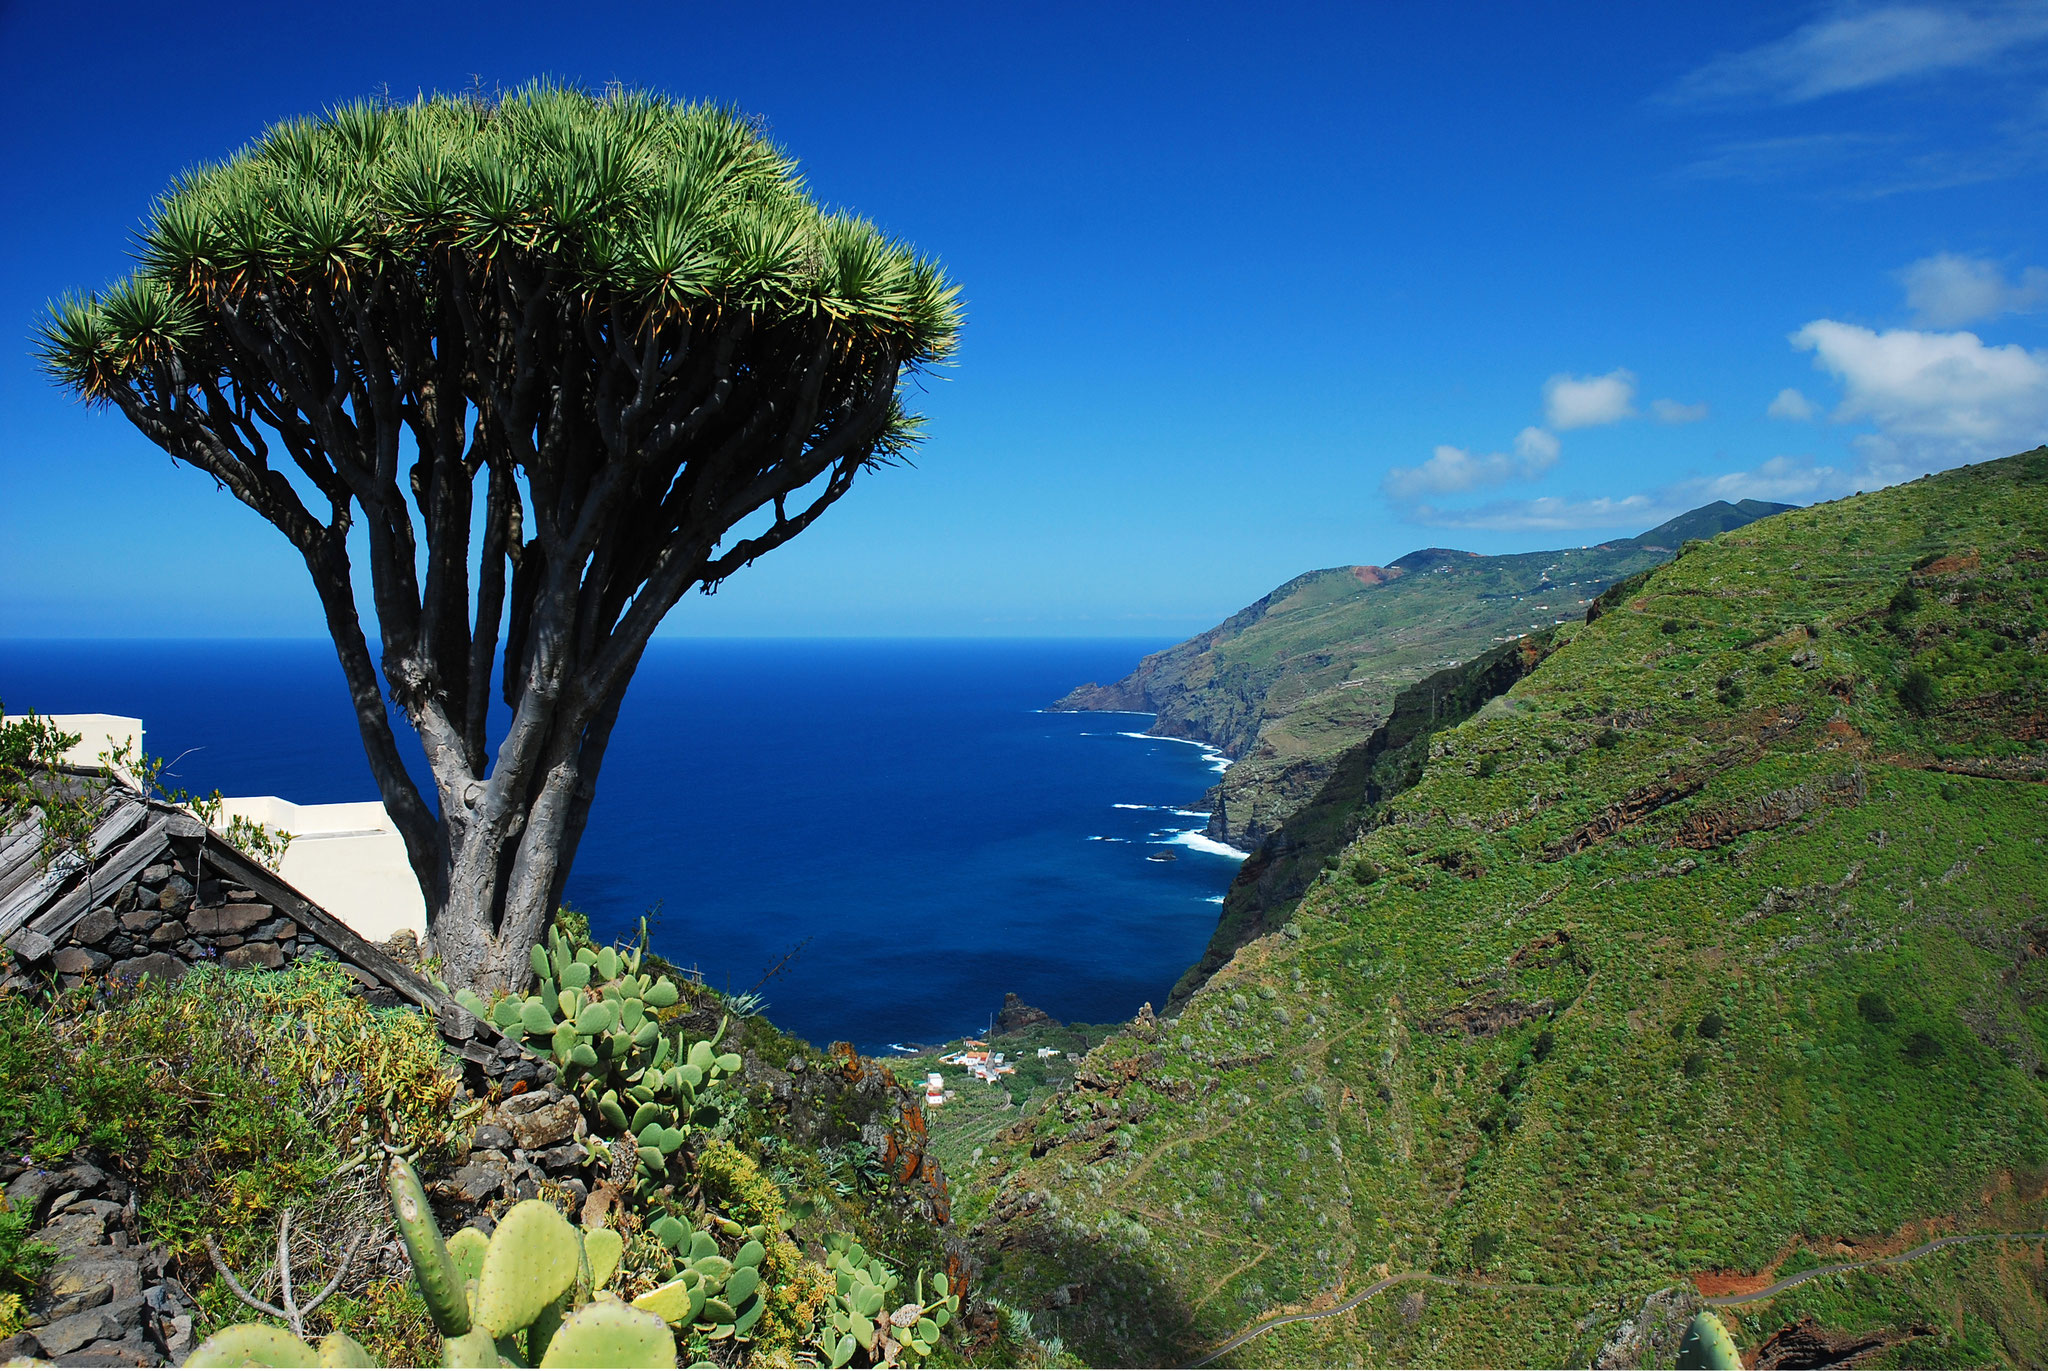 Blick auf Barlovento, La Palma